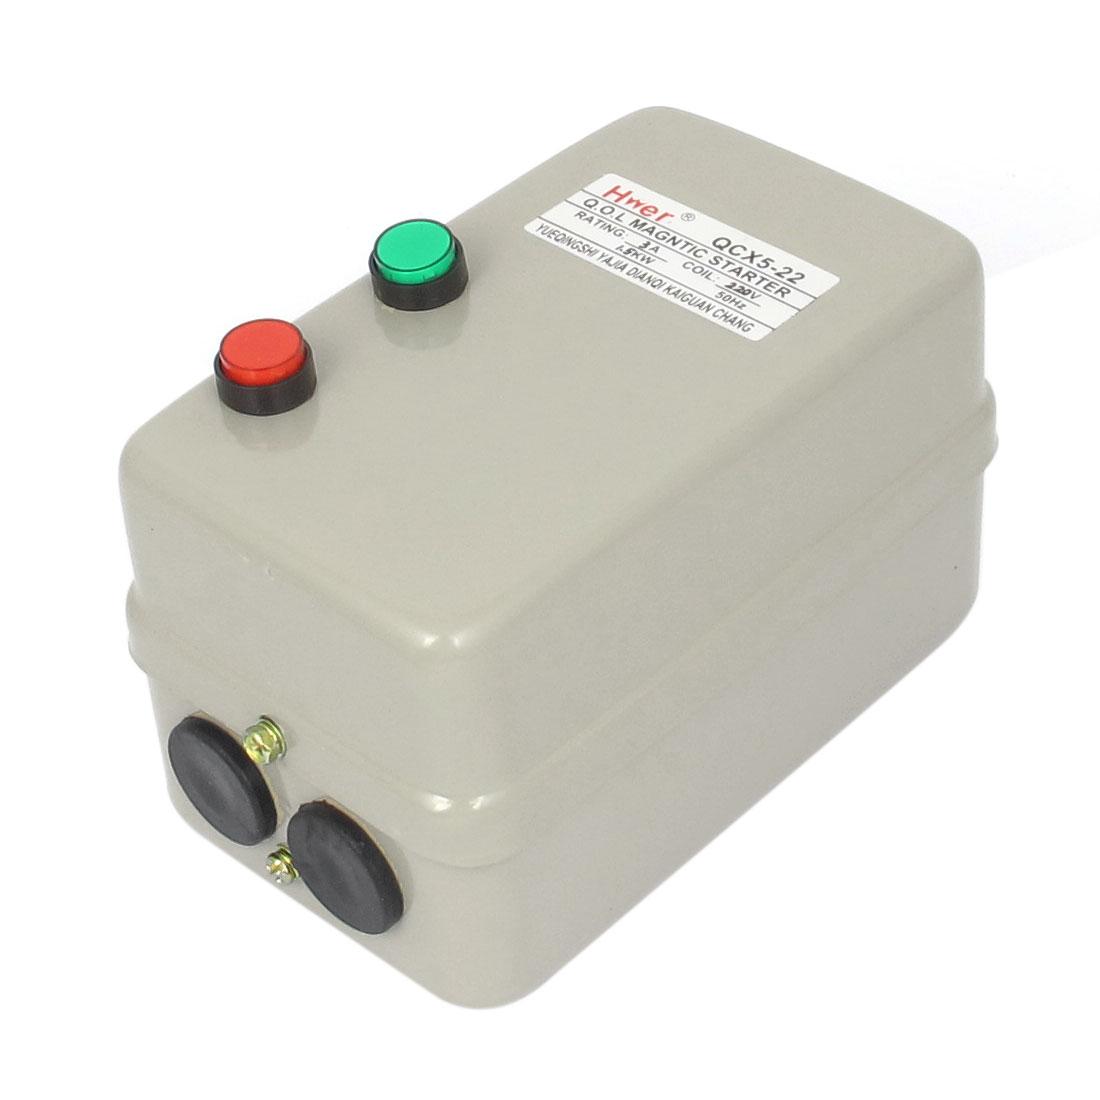 220V Coil Motor Control Push Button Electromagnetic Magnetic Starter